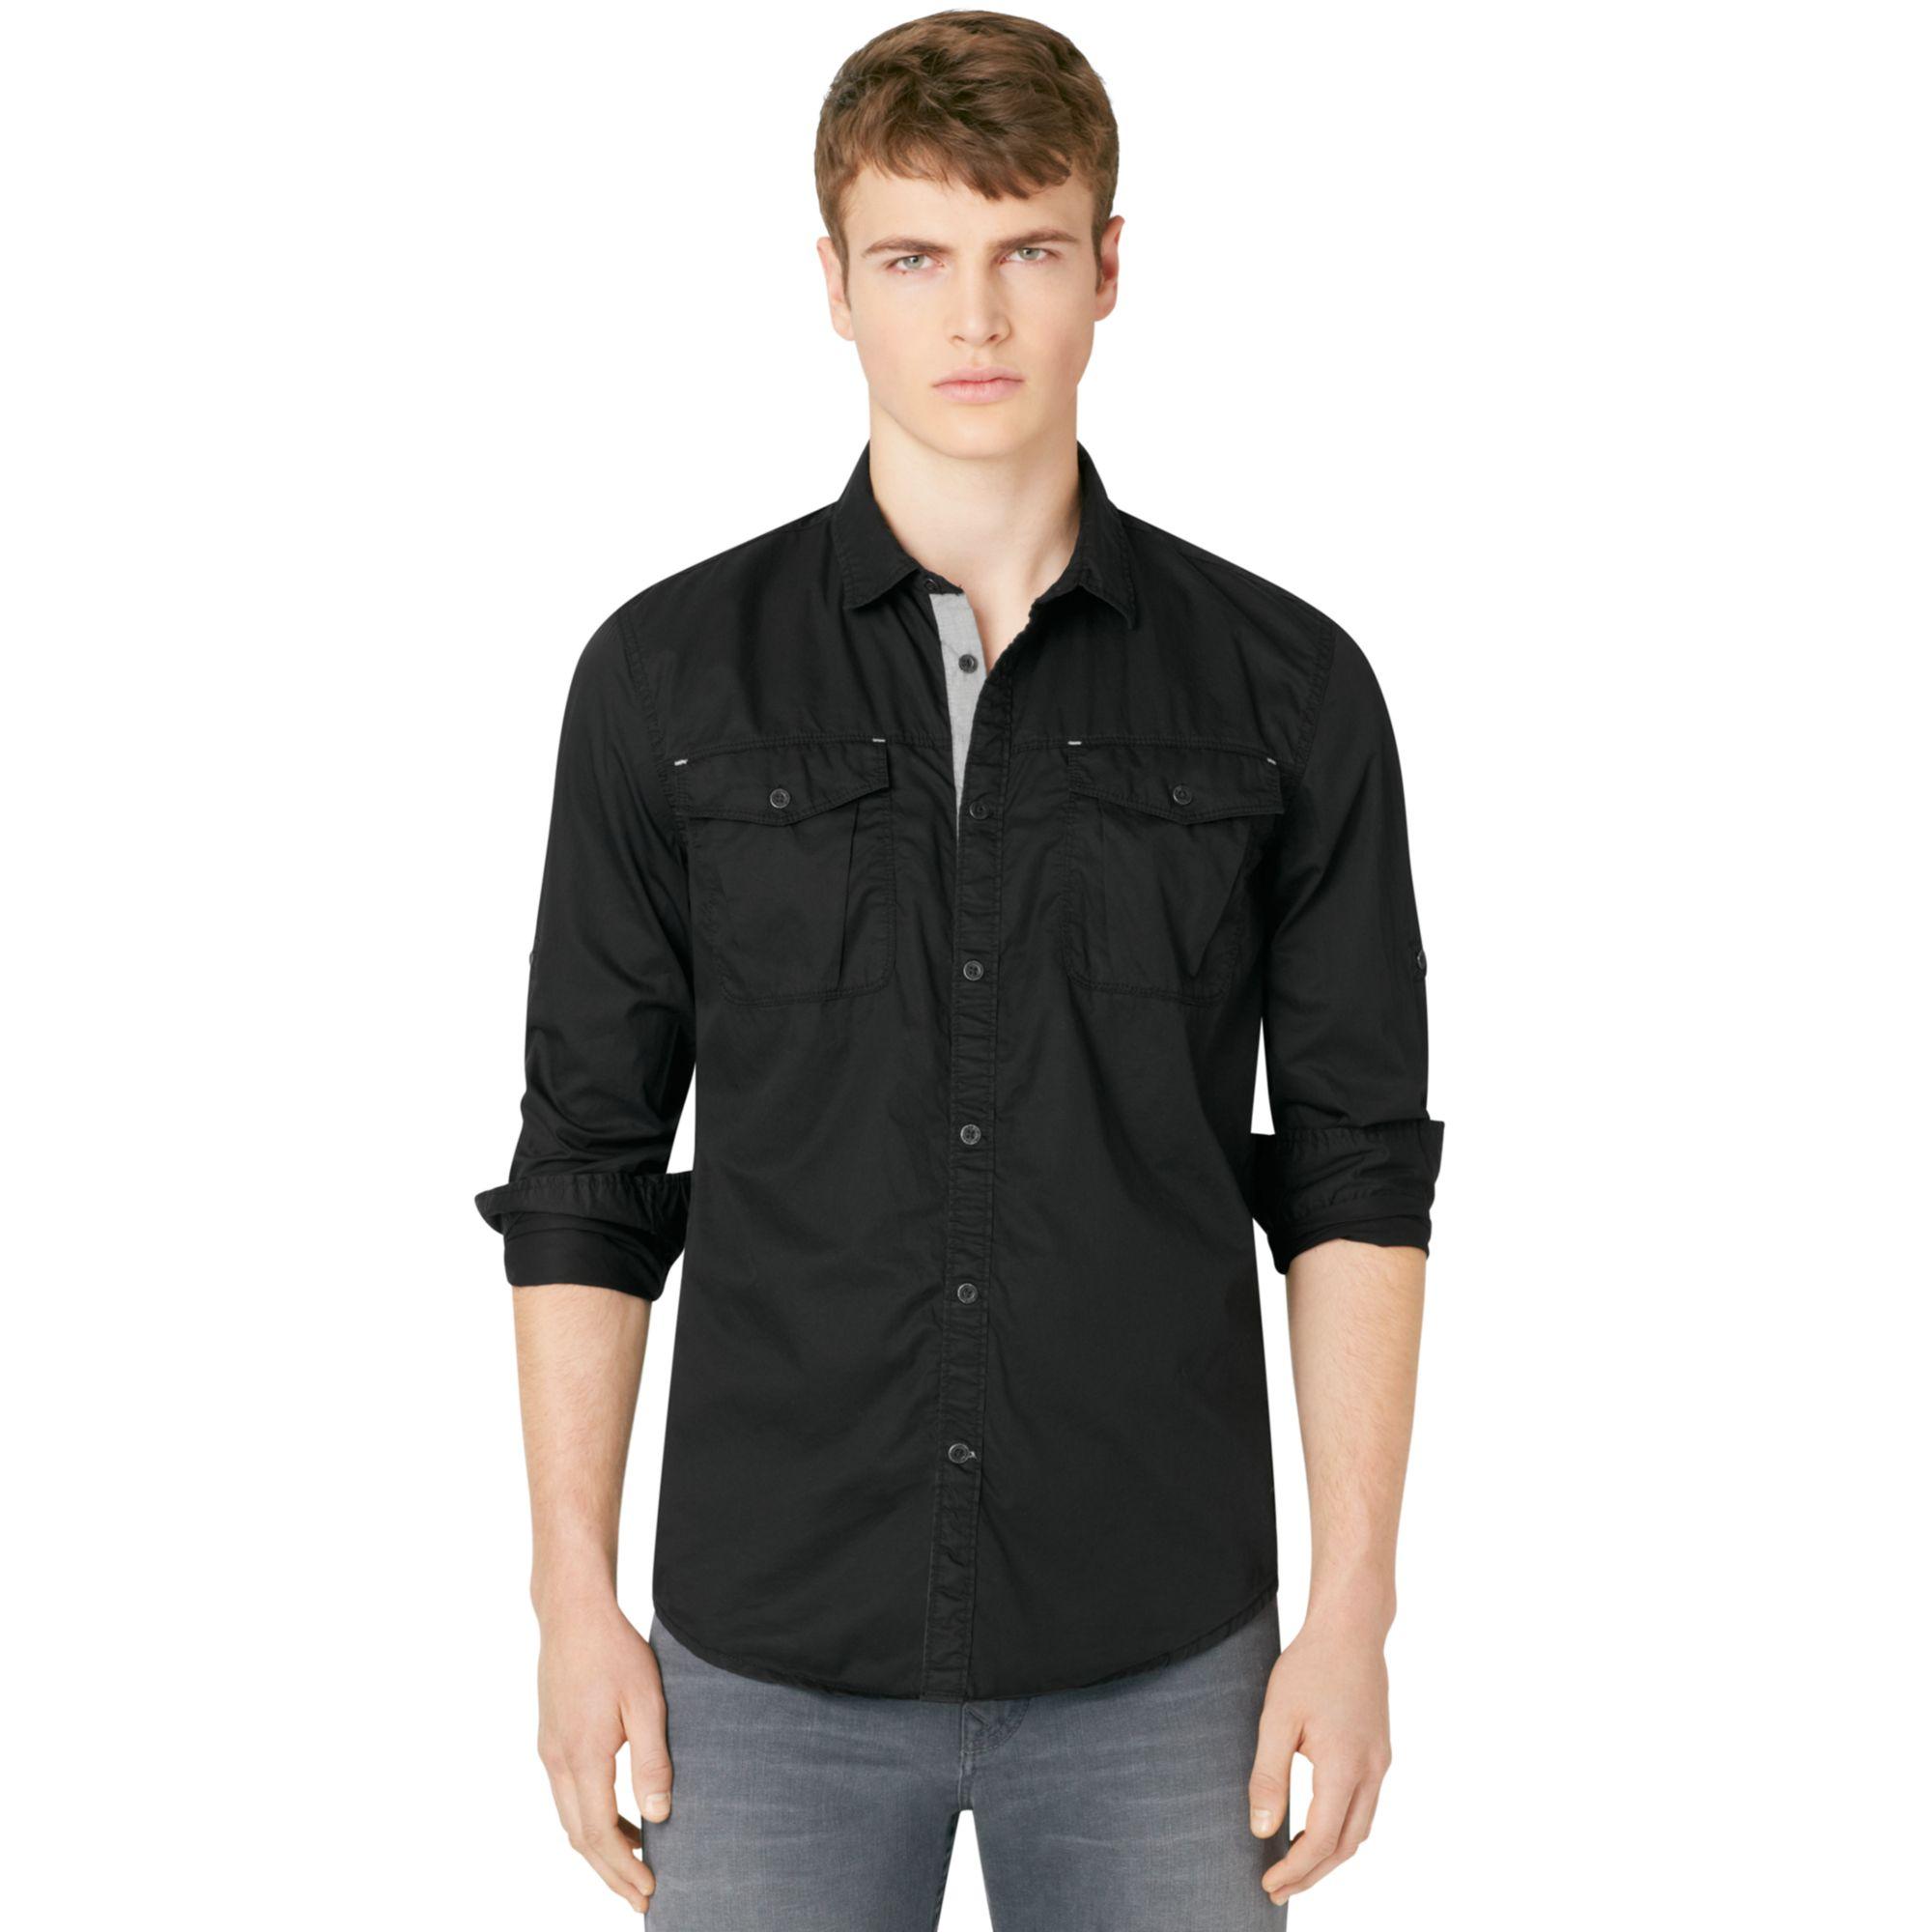 calvin klein jeans buttondown shirt in black for men lyst. Black Bedroom Furniture Sets. Home Design Ideas